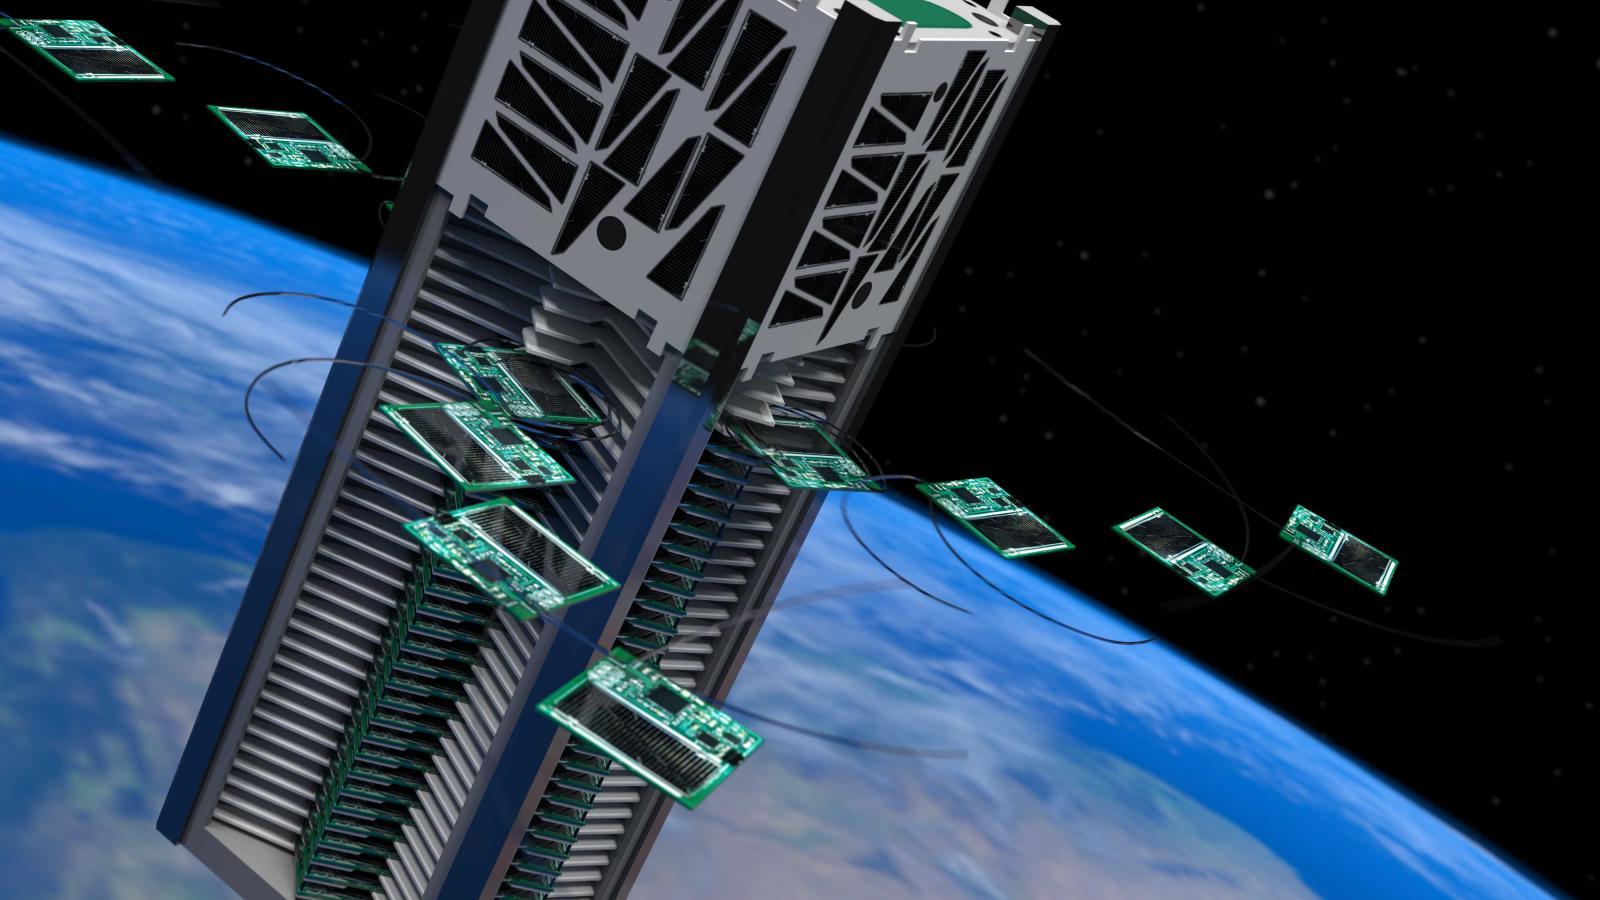 Стивен Хокинг иЮрий Мильнер объявили озапуске нанозондов наорбиту